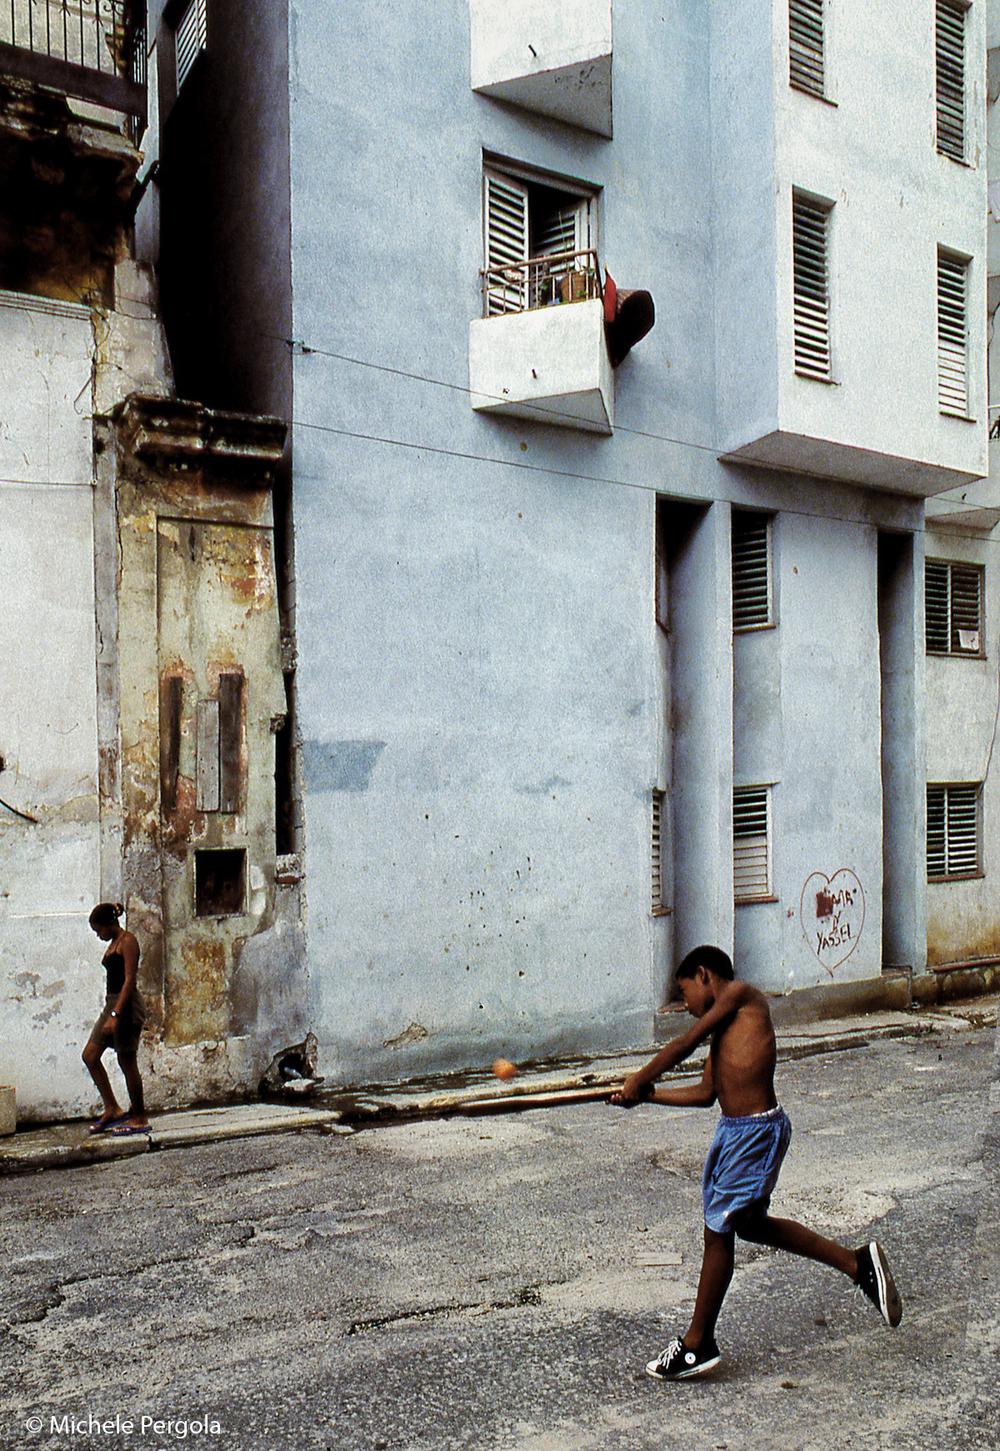 San Cristóbal deLa Habana (Cuba, 2001)